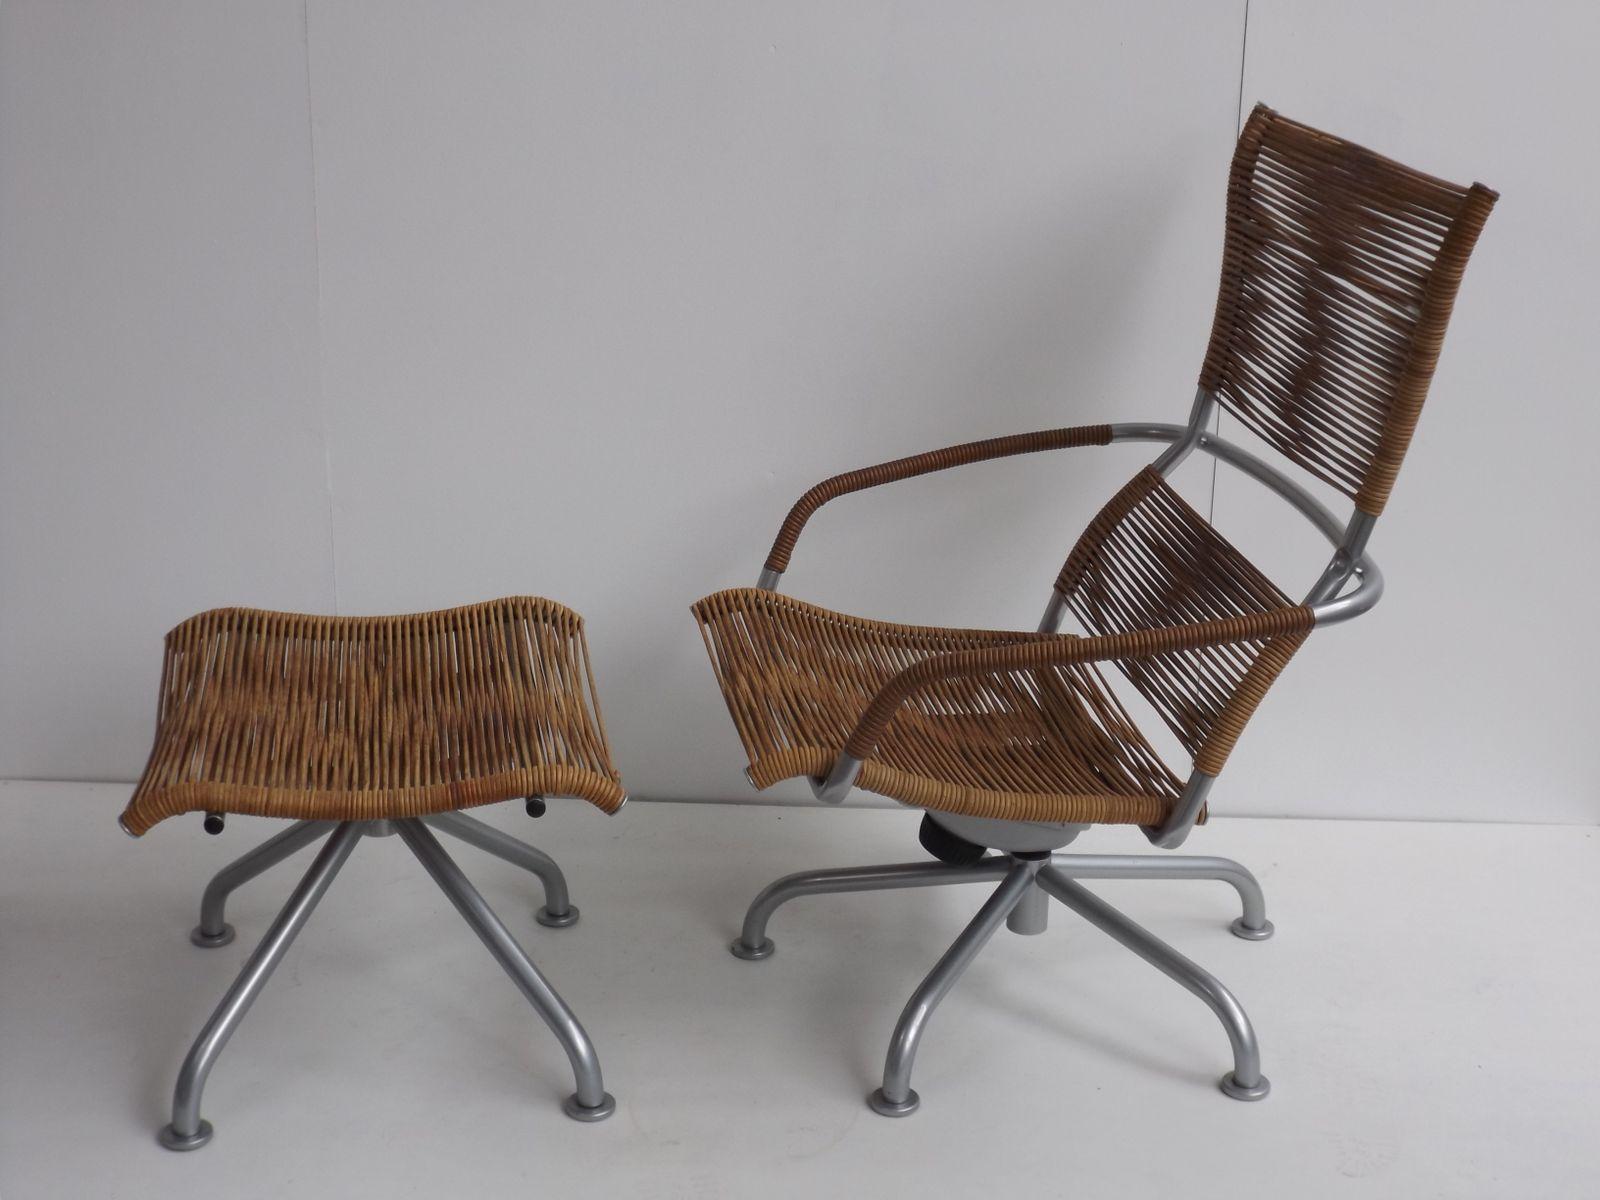 vintage miss b sessel mit hocker von tito agnoli f r pierantonio bonacina bei pamono kaufen. Black Bedroom Furniture Sets. Home Design Ideas